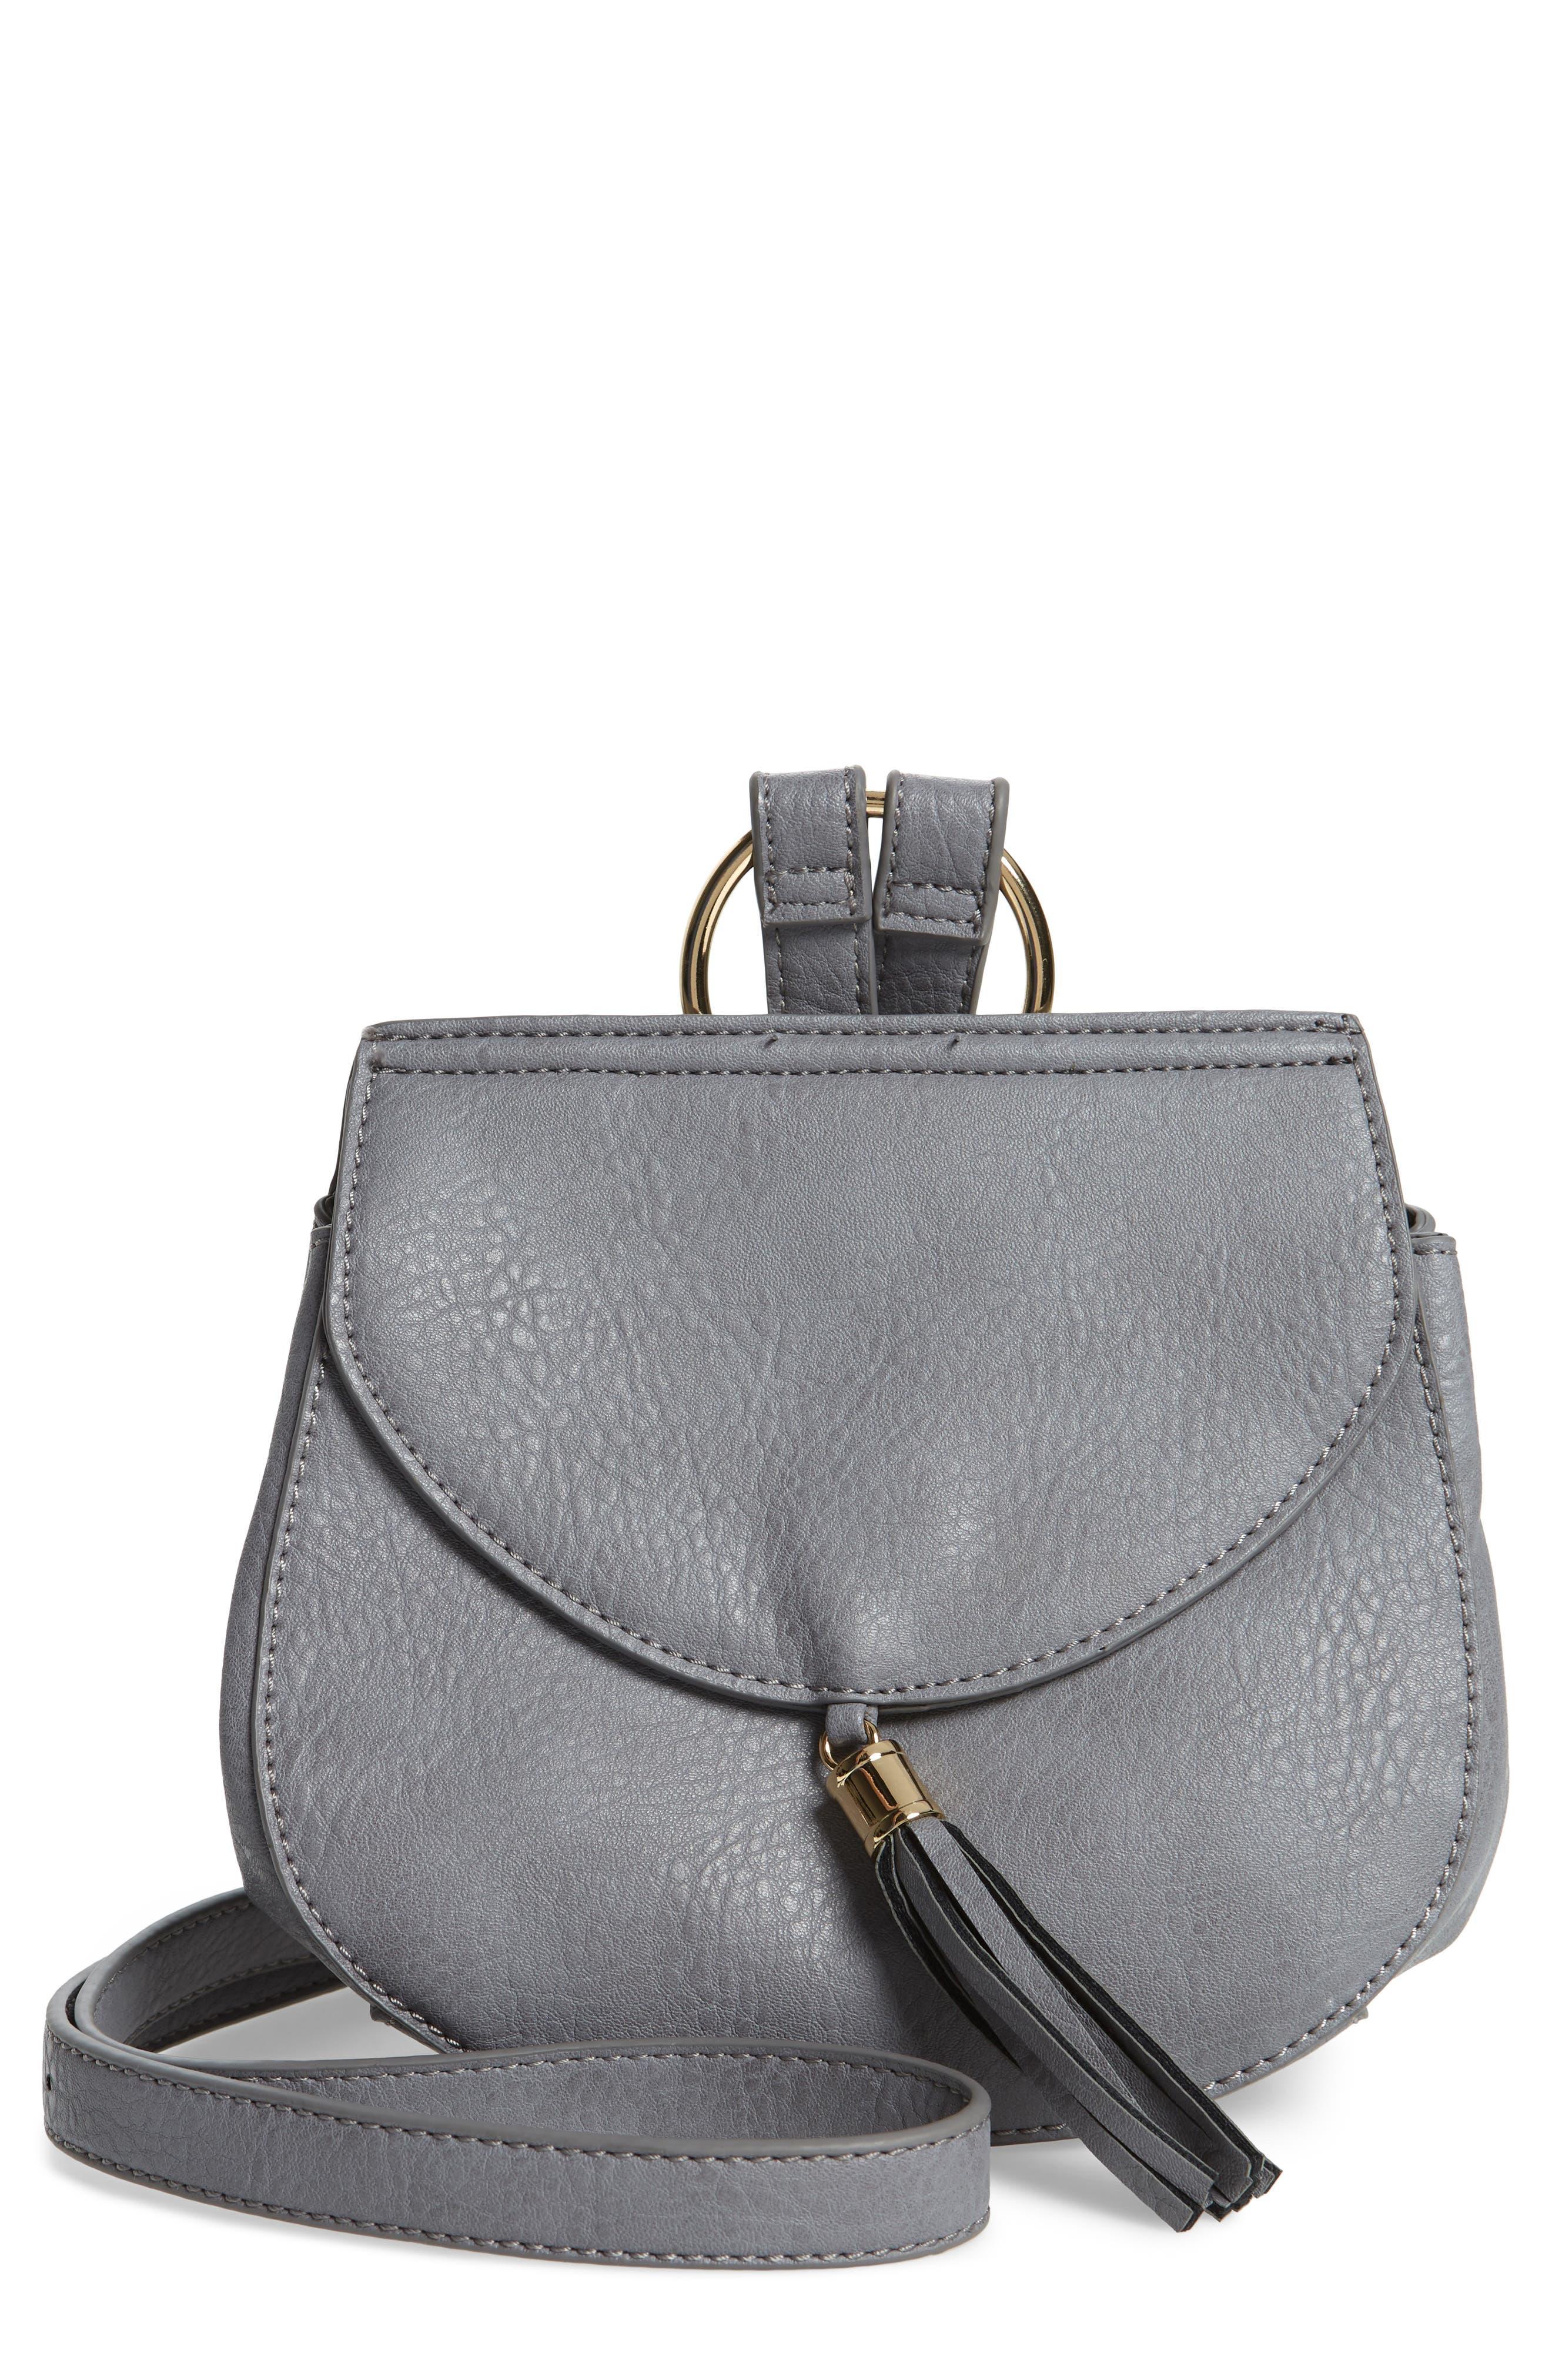 Tassel Faux Leather Crossbody Saddle Bag,                         Main,                         color, Grey